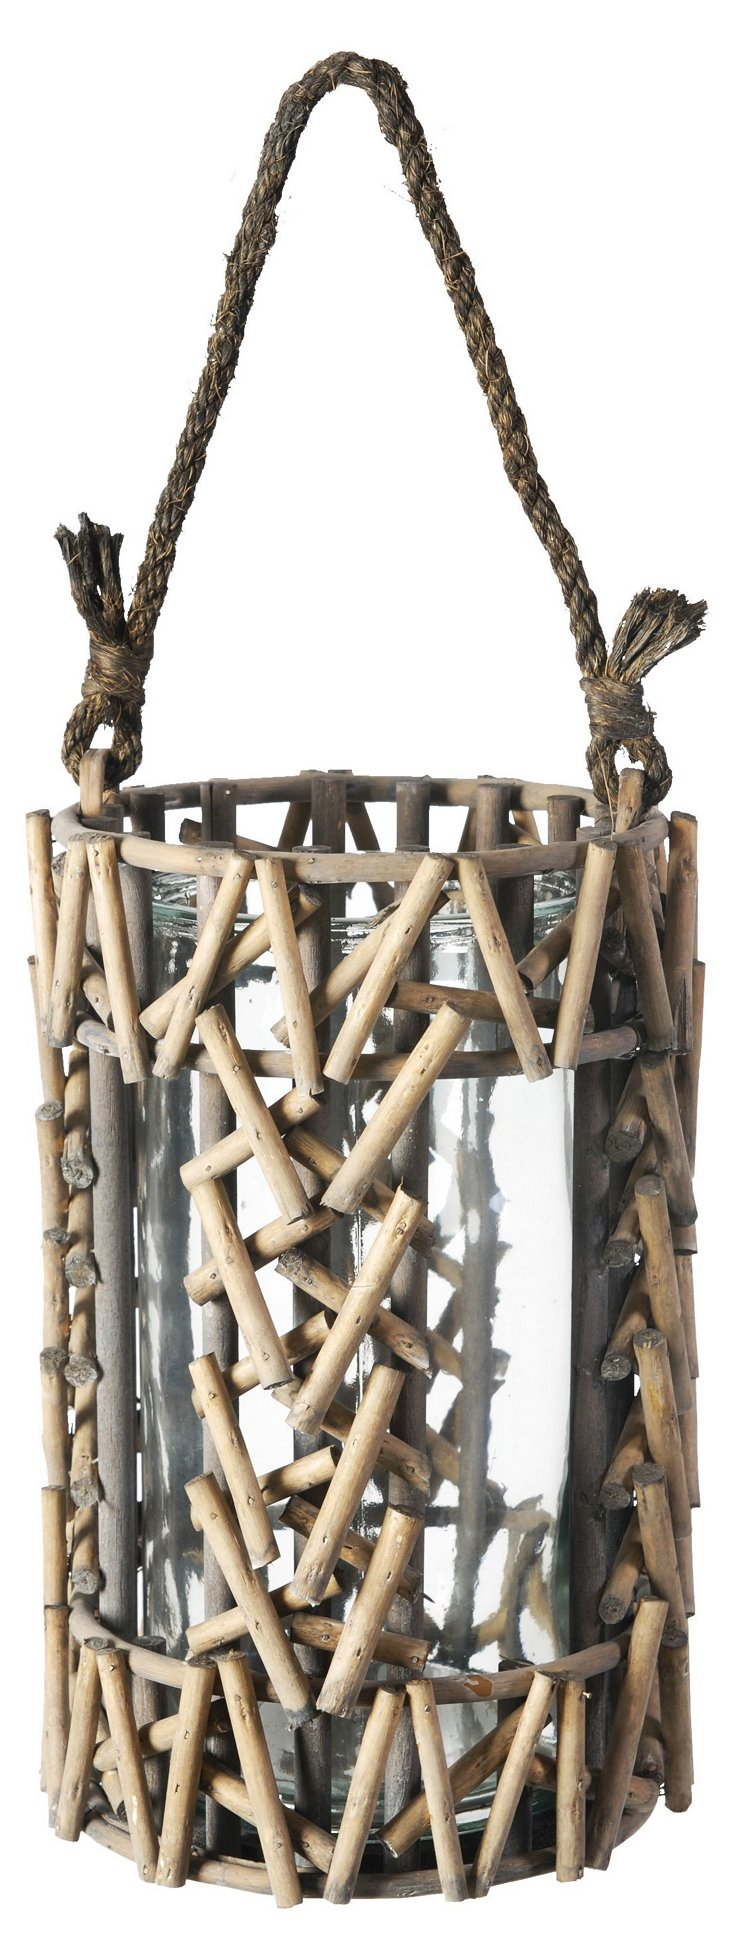 "13"" Wooden Stick Hurricane"